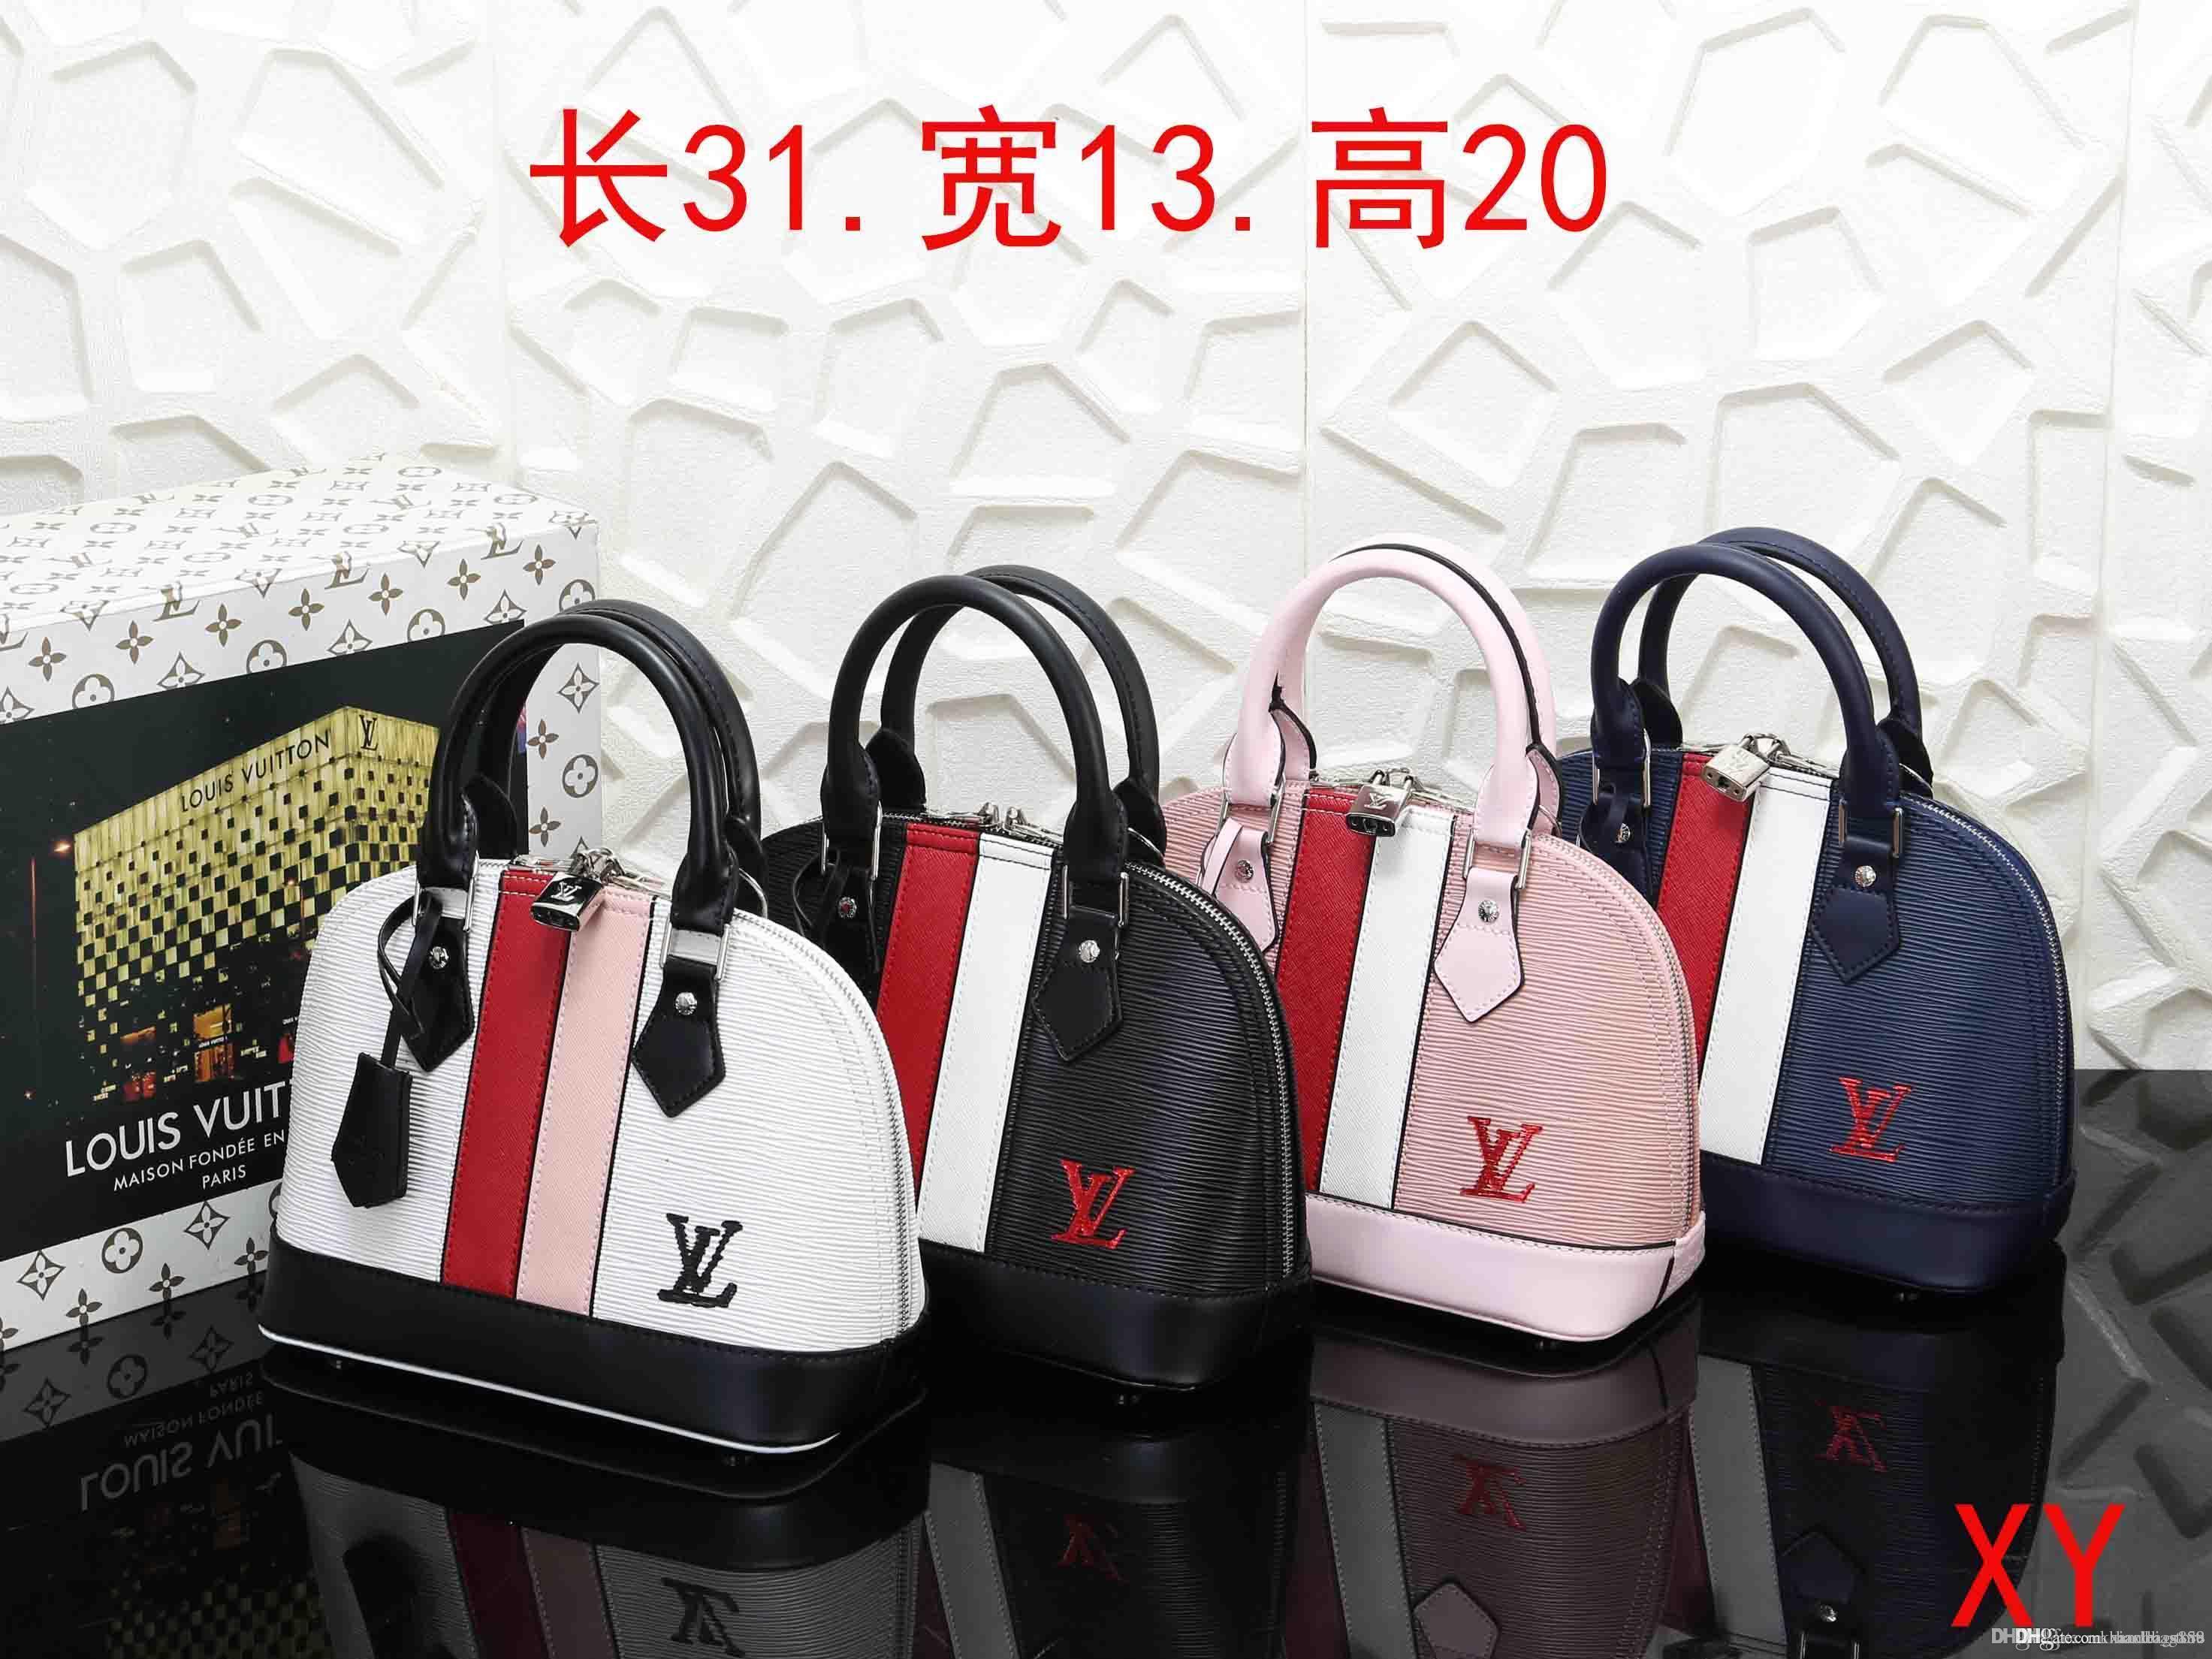 654de6295eeb 2019 MK 001 Xy NEW Styles Fashion Bags Ladies Handbags Designer Bags Women  Tote Bag Luxury Brands Bags Single Shoulder Bag From Xiaolei store